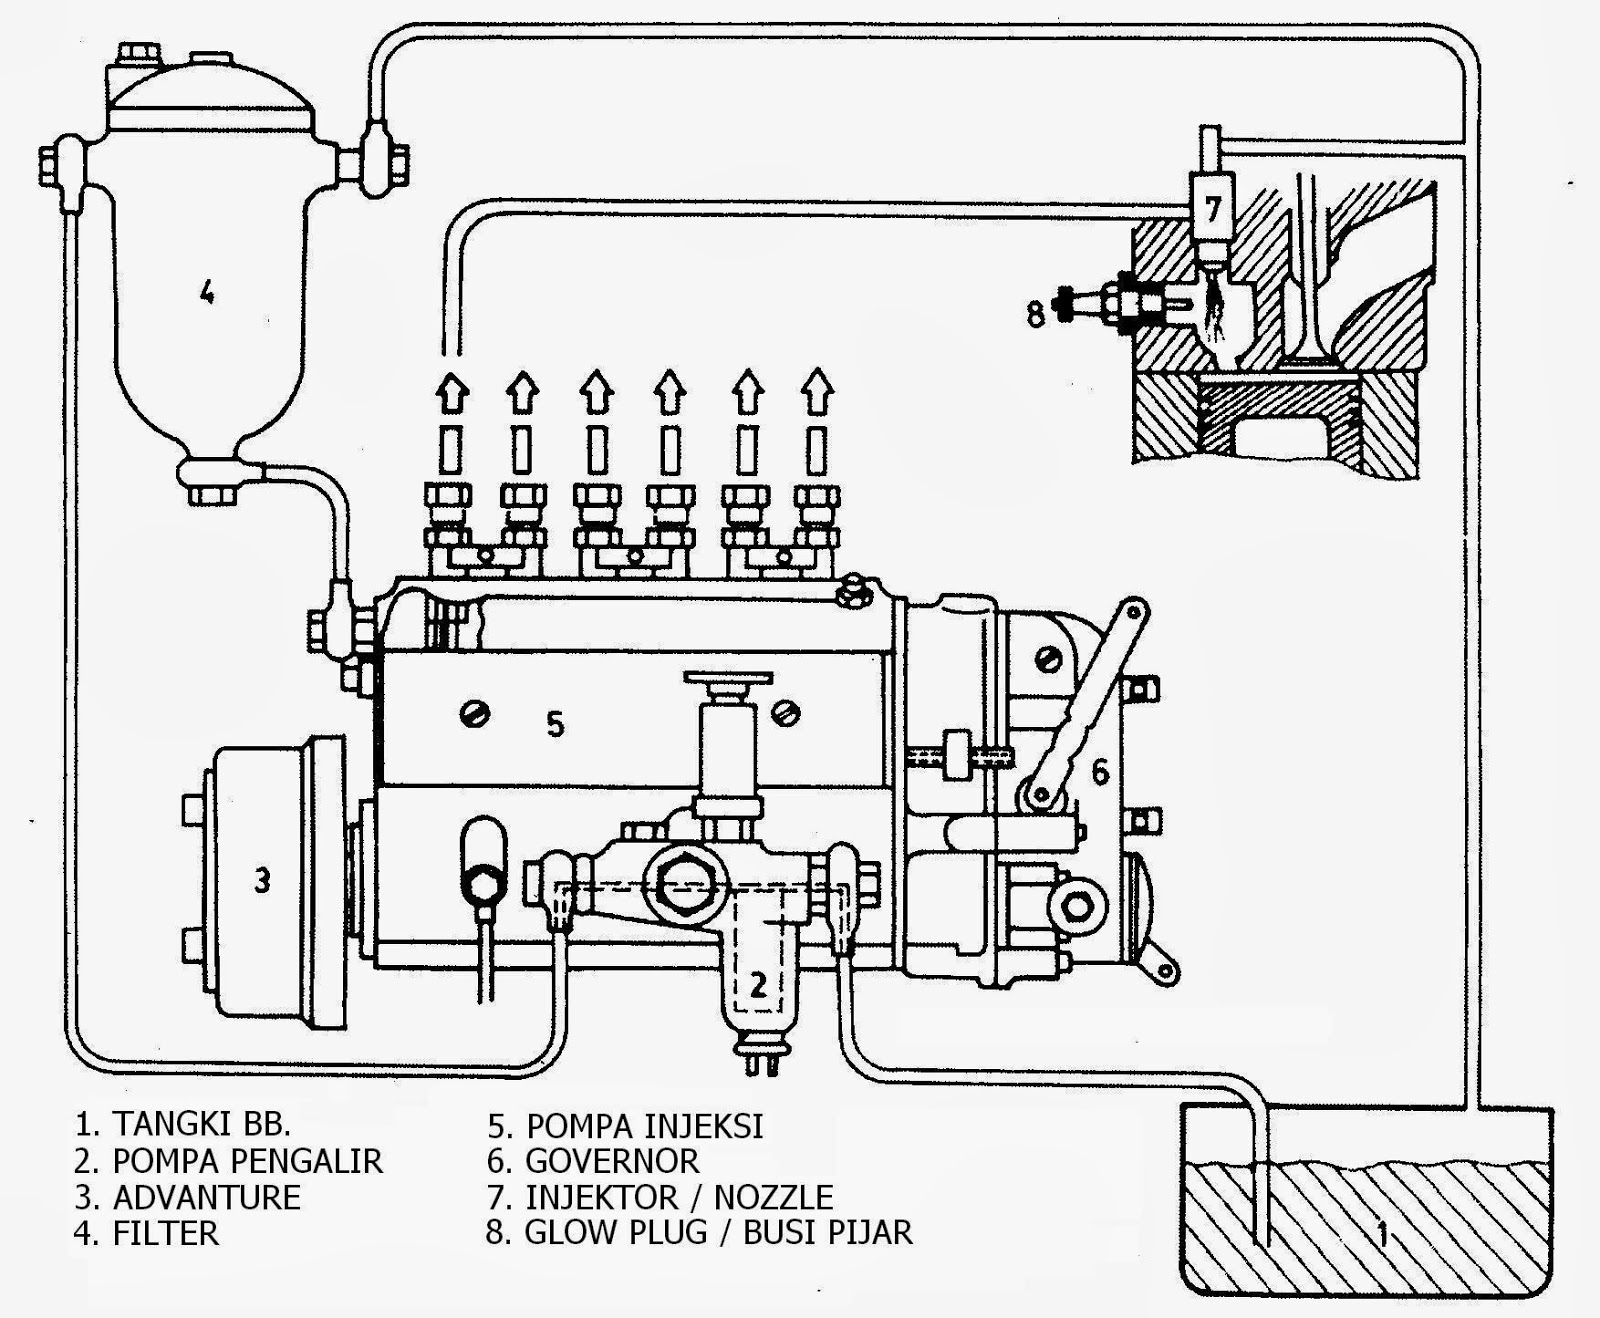 04 hyundai elantra fuse box diagram hyundai auto wiring 2003 hyundai santa fe audio wiring diagram 2000 hyundai tiburon wiring schematic [ 1600 x 1318 Pixel ]